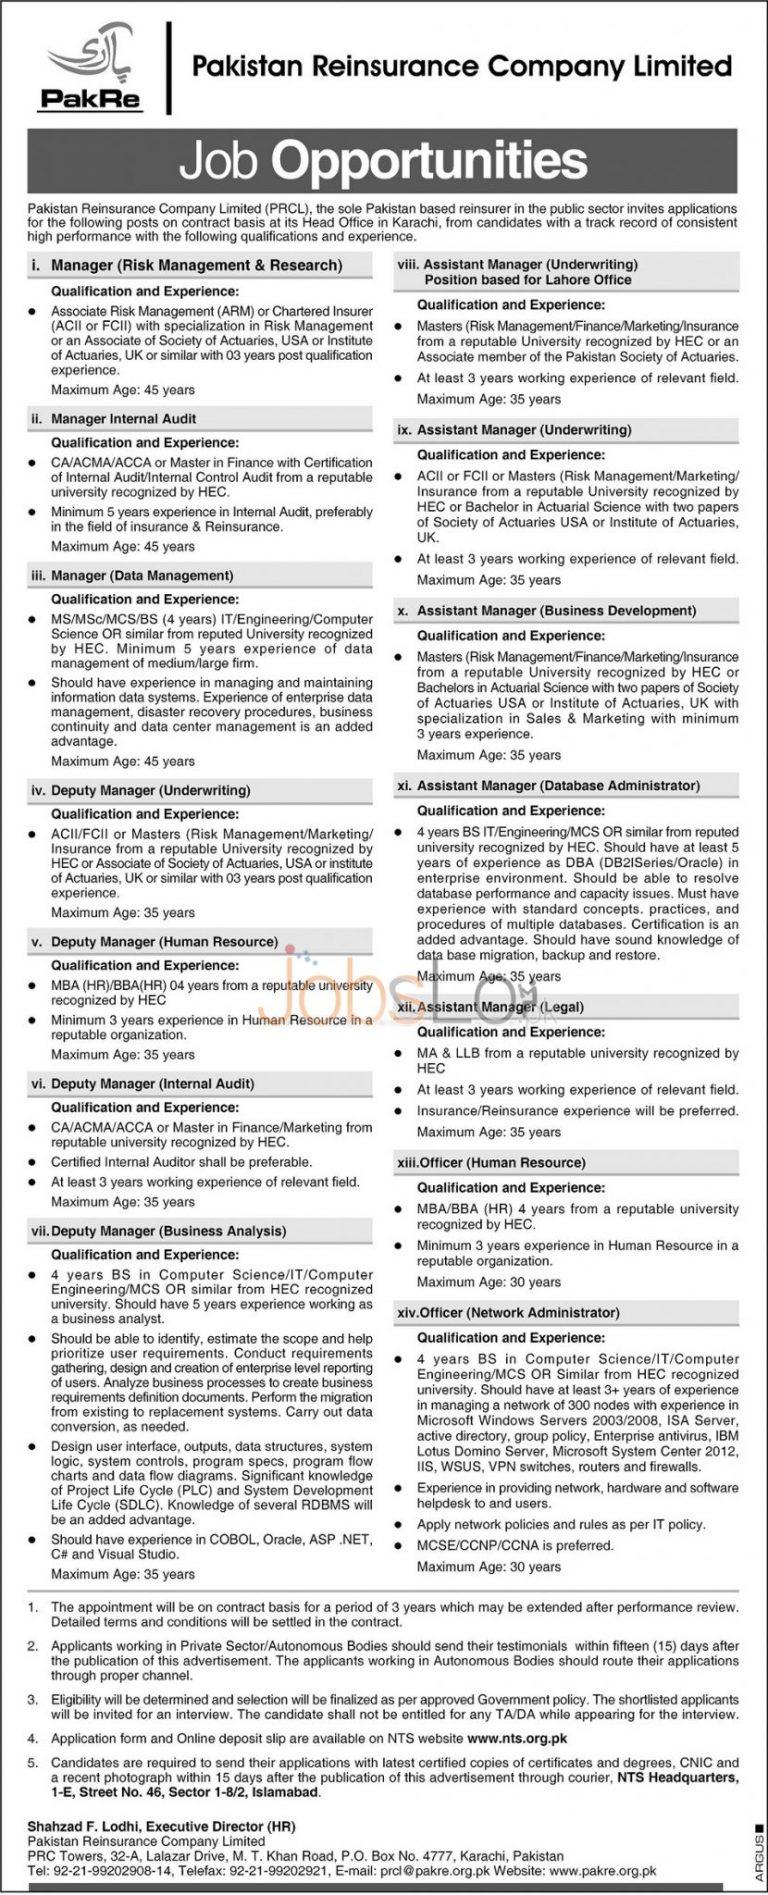 Pakistan Reinsurance Company PRCL Karachi Jobs May 2016 NTS Application Form Download Online